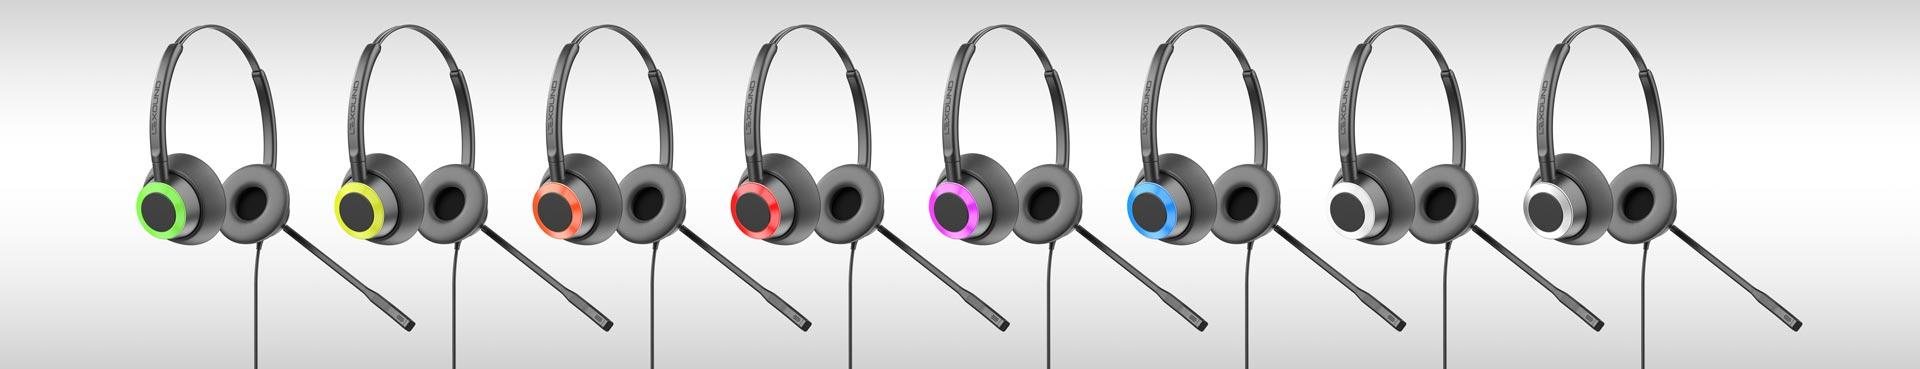 callcentre-headset